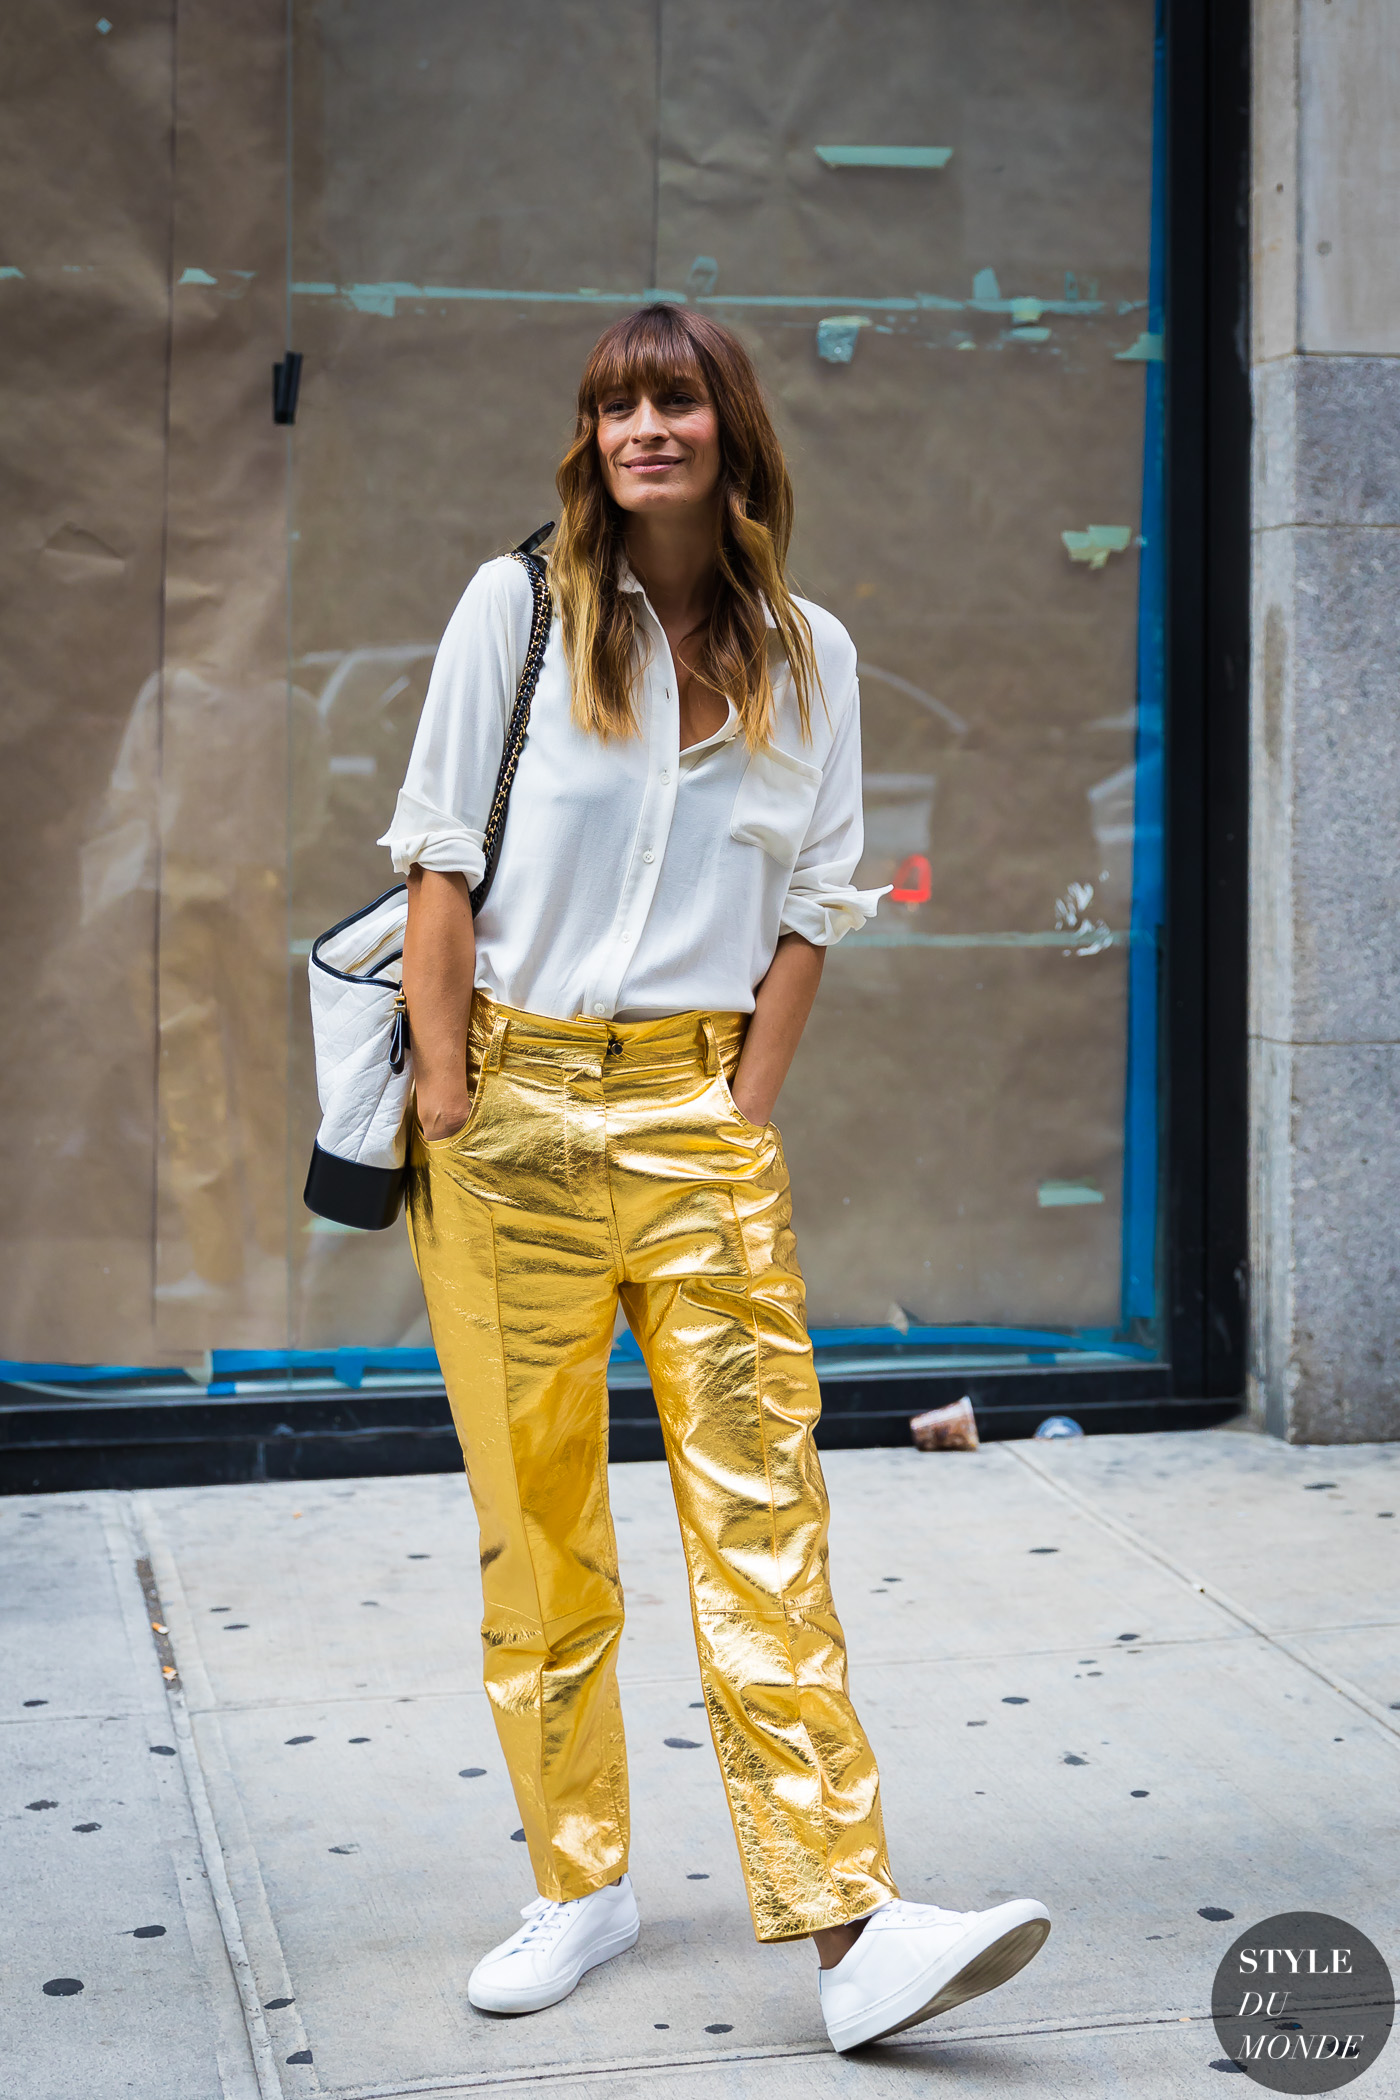 New York Fashion Shows December